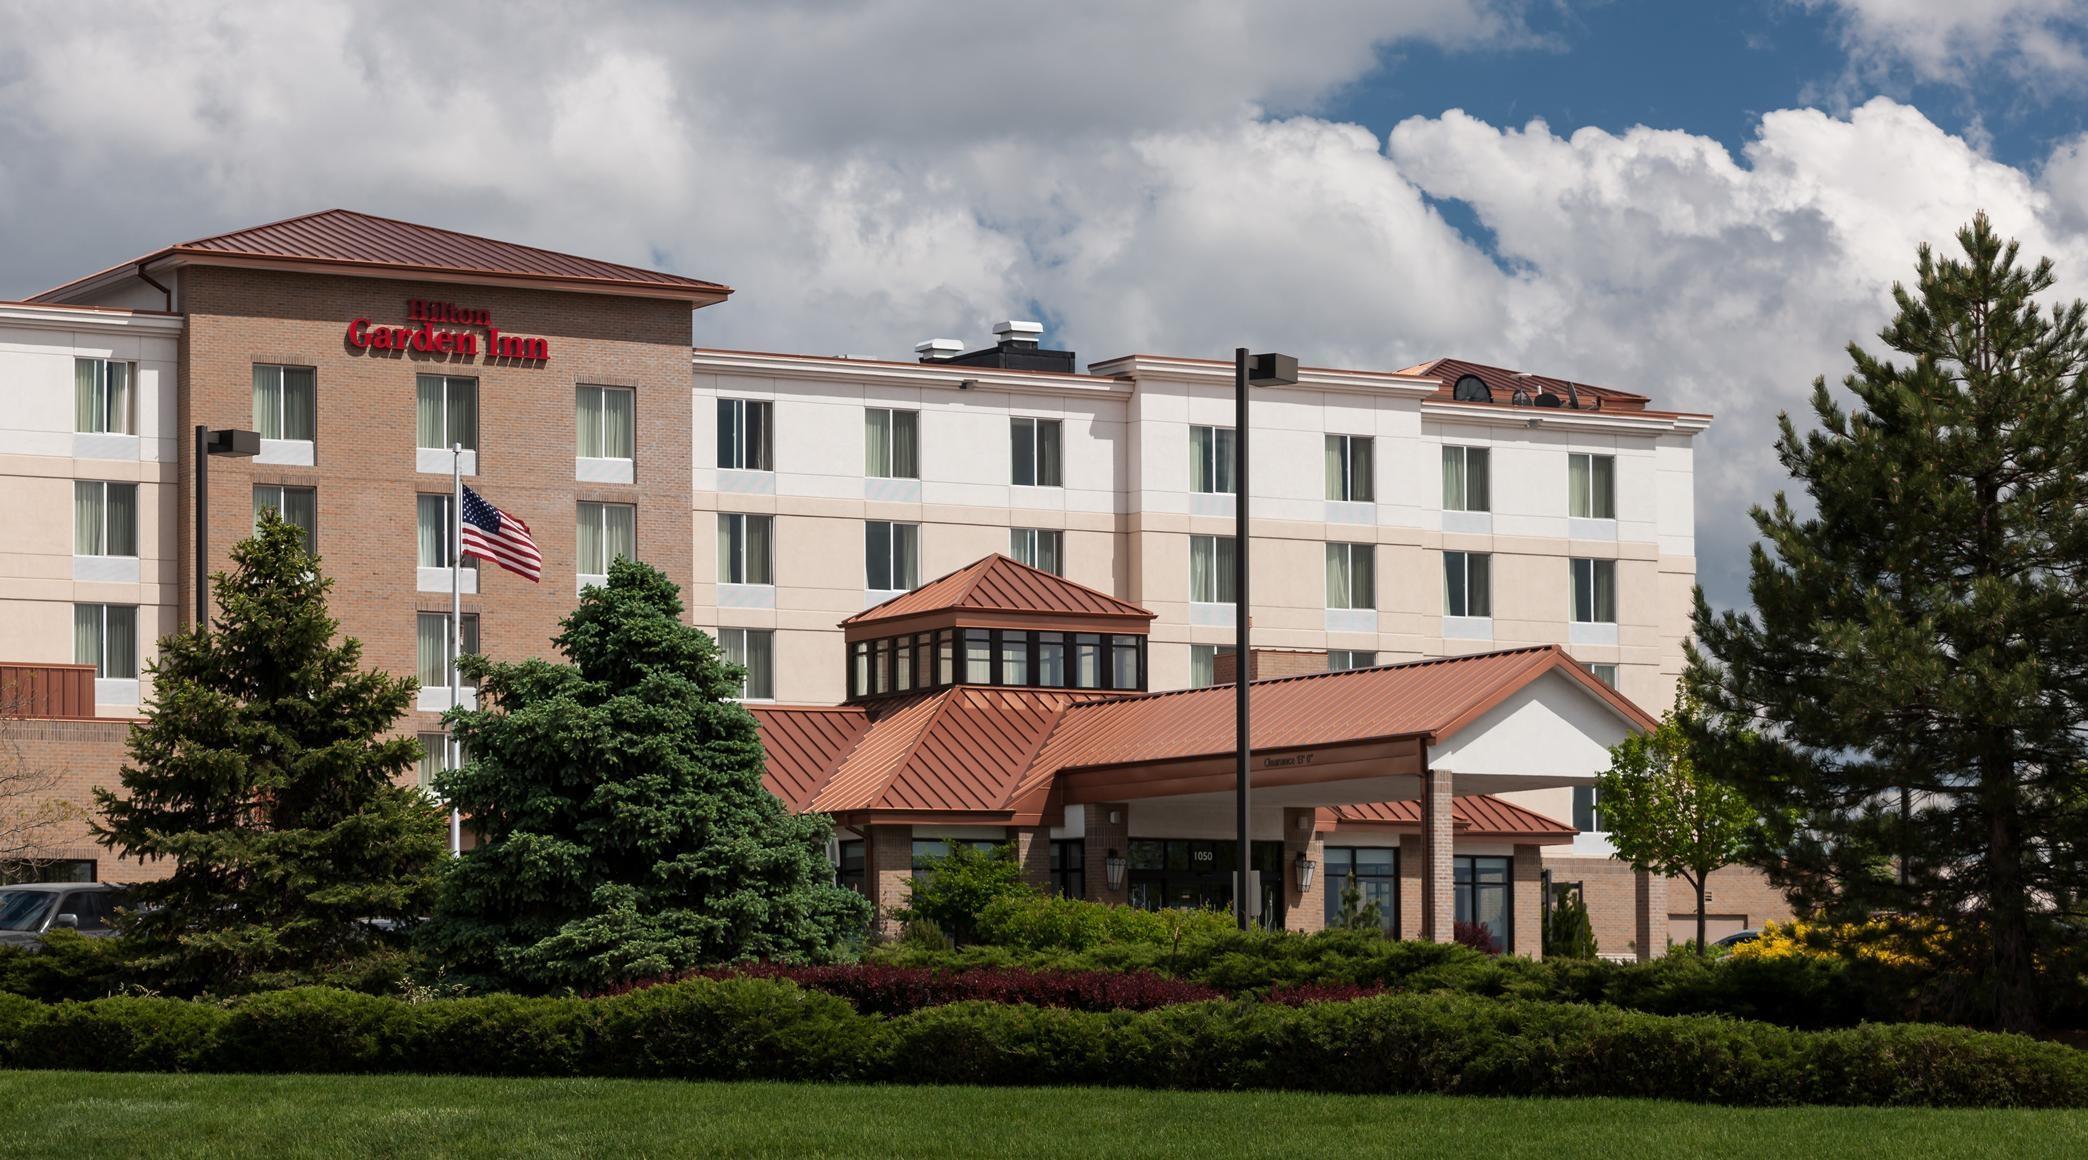 Hilton Garden Inn Denver/Highlands Ranch image 1